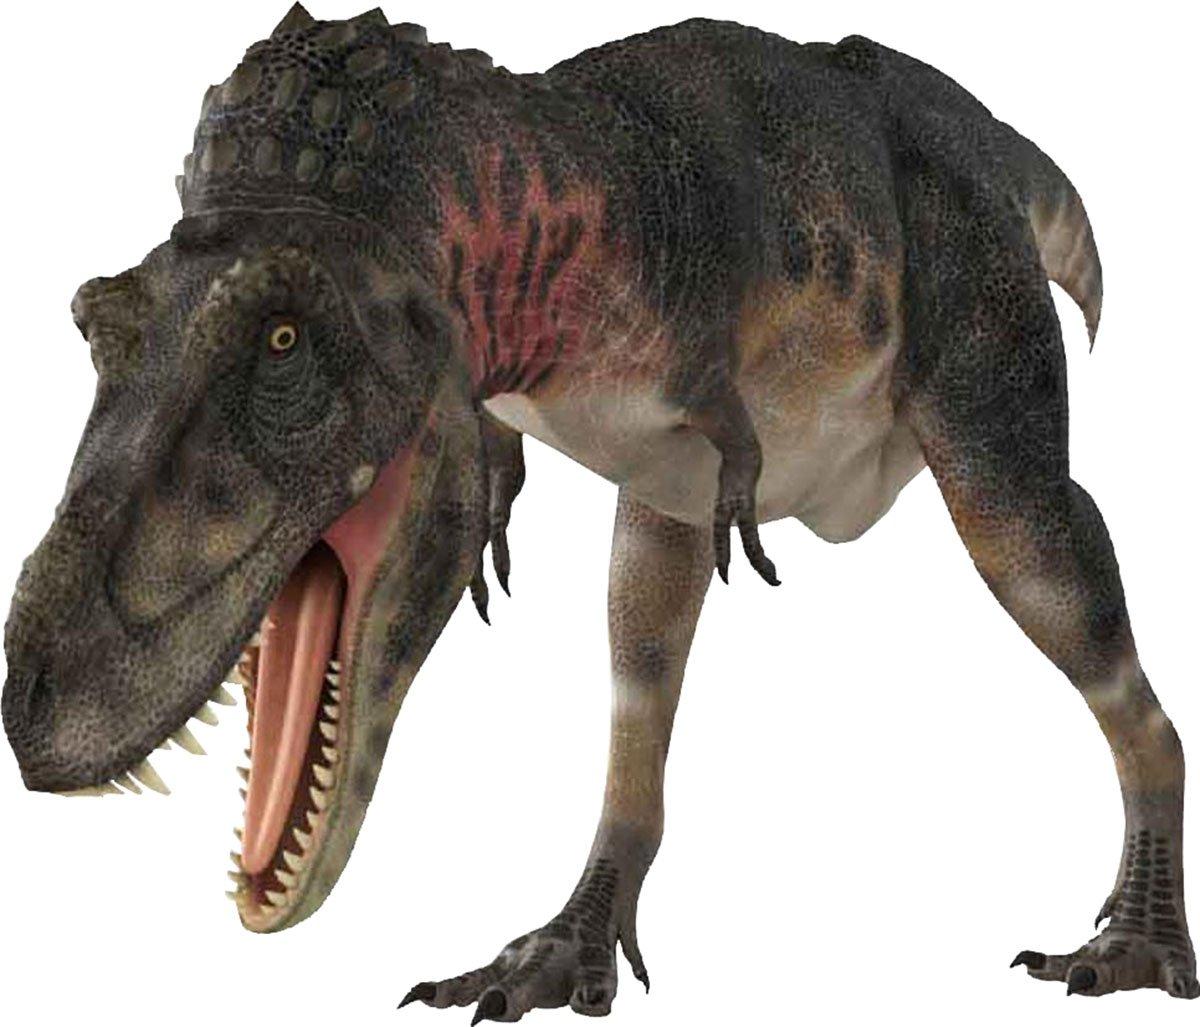 Brainstorm INFANTIL EDUCATIVO JUGUETES ANIMAL Imágenes Dinosaurio ...